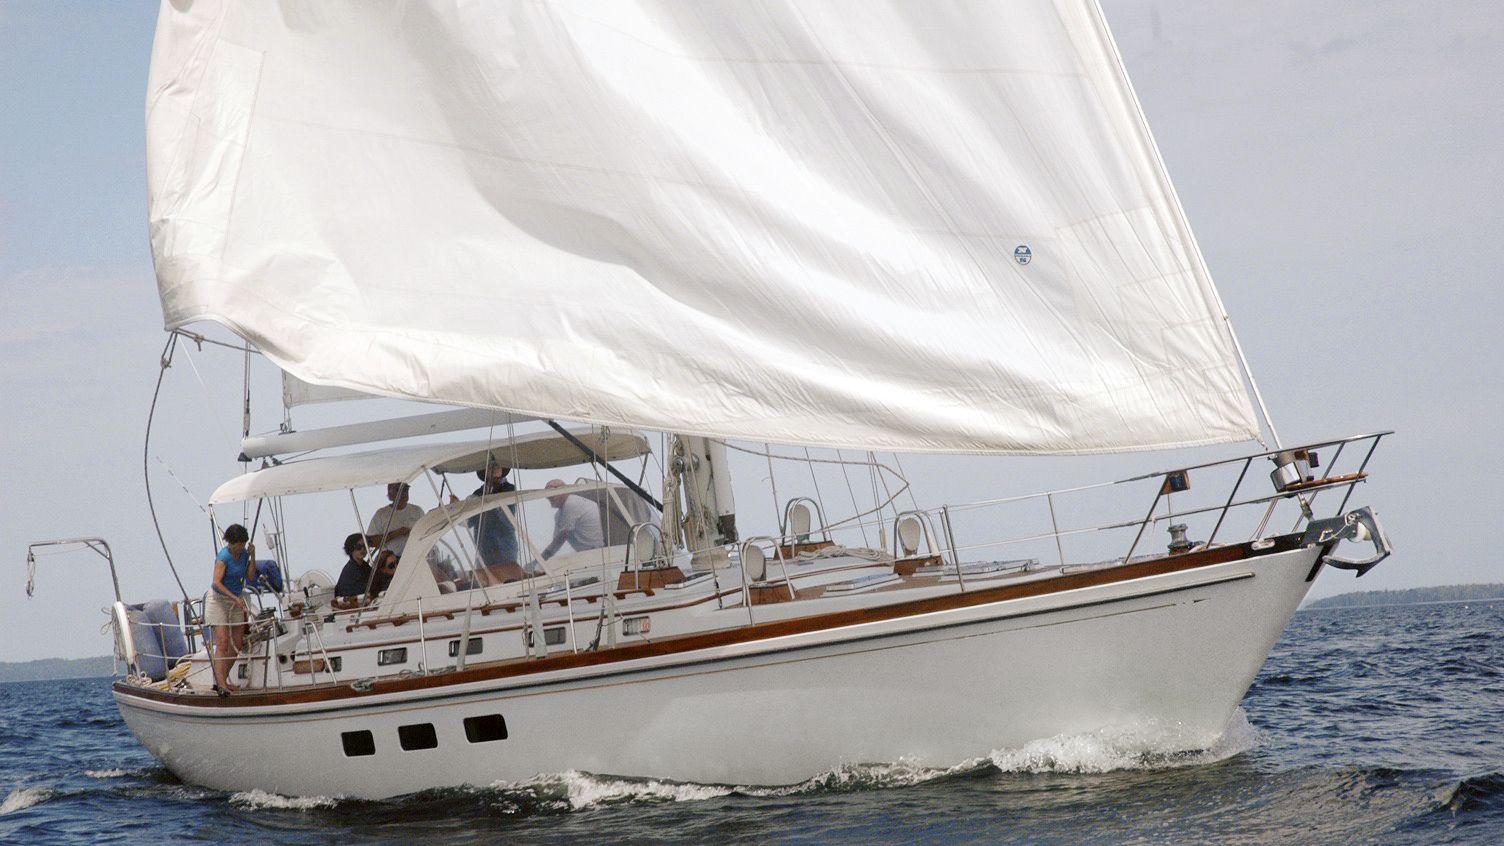 snowhawk-wooden-sailing-yacht-sloss-on-water-tight-jpg-1561480630.jpg